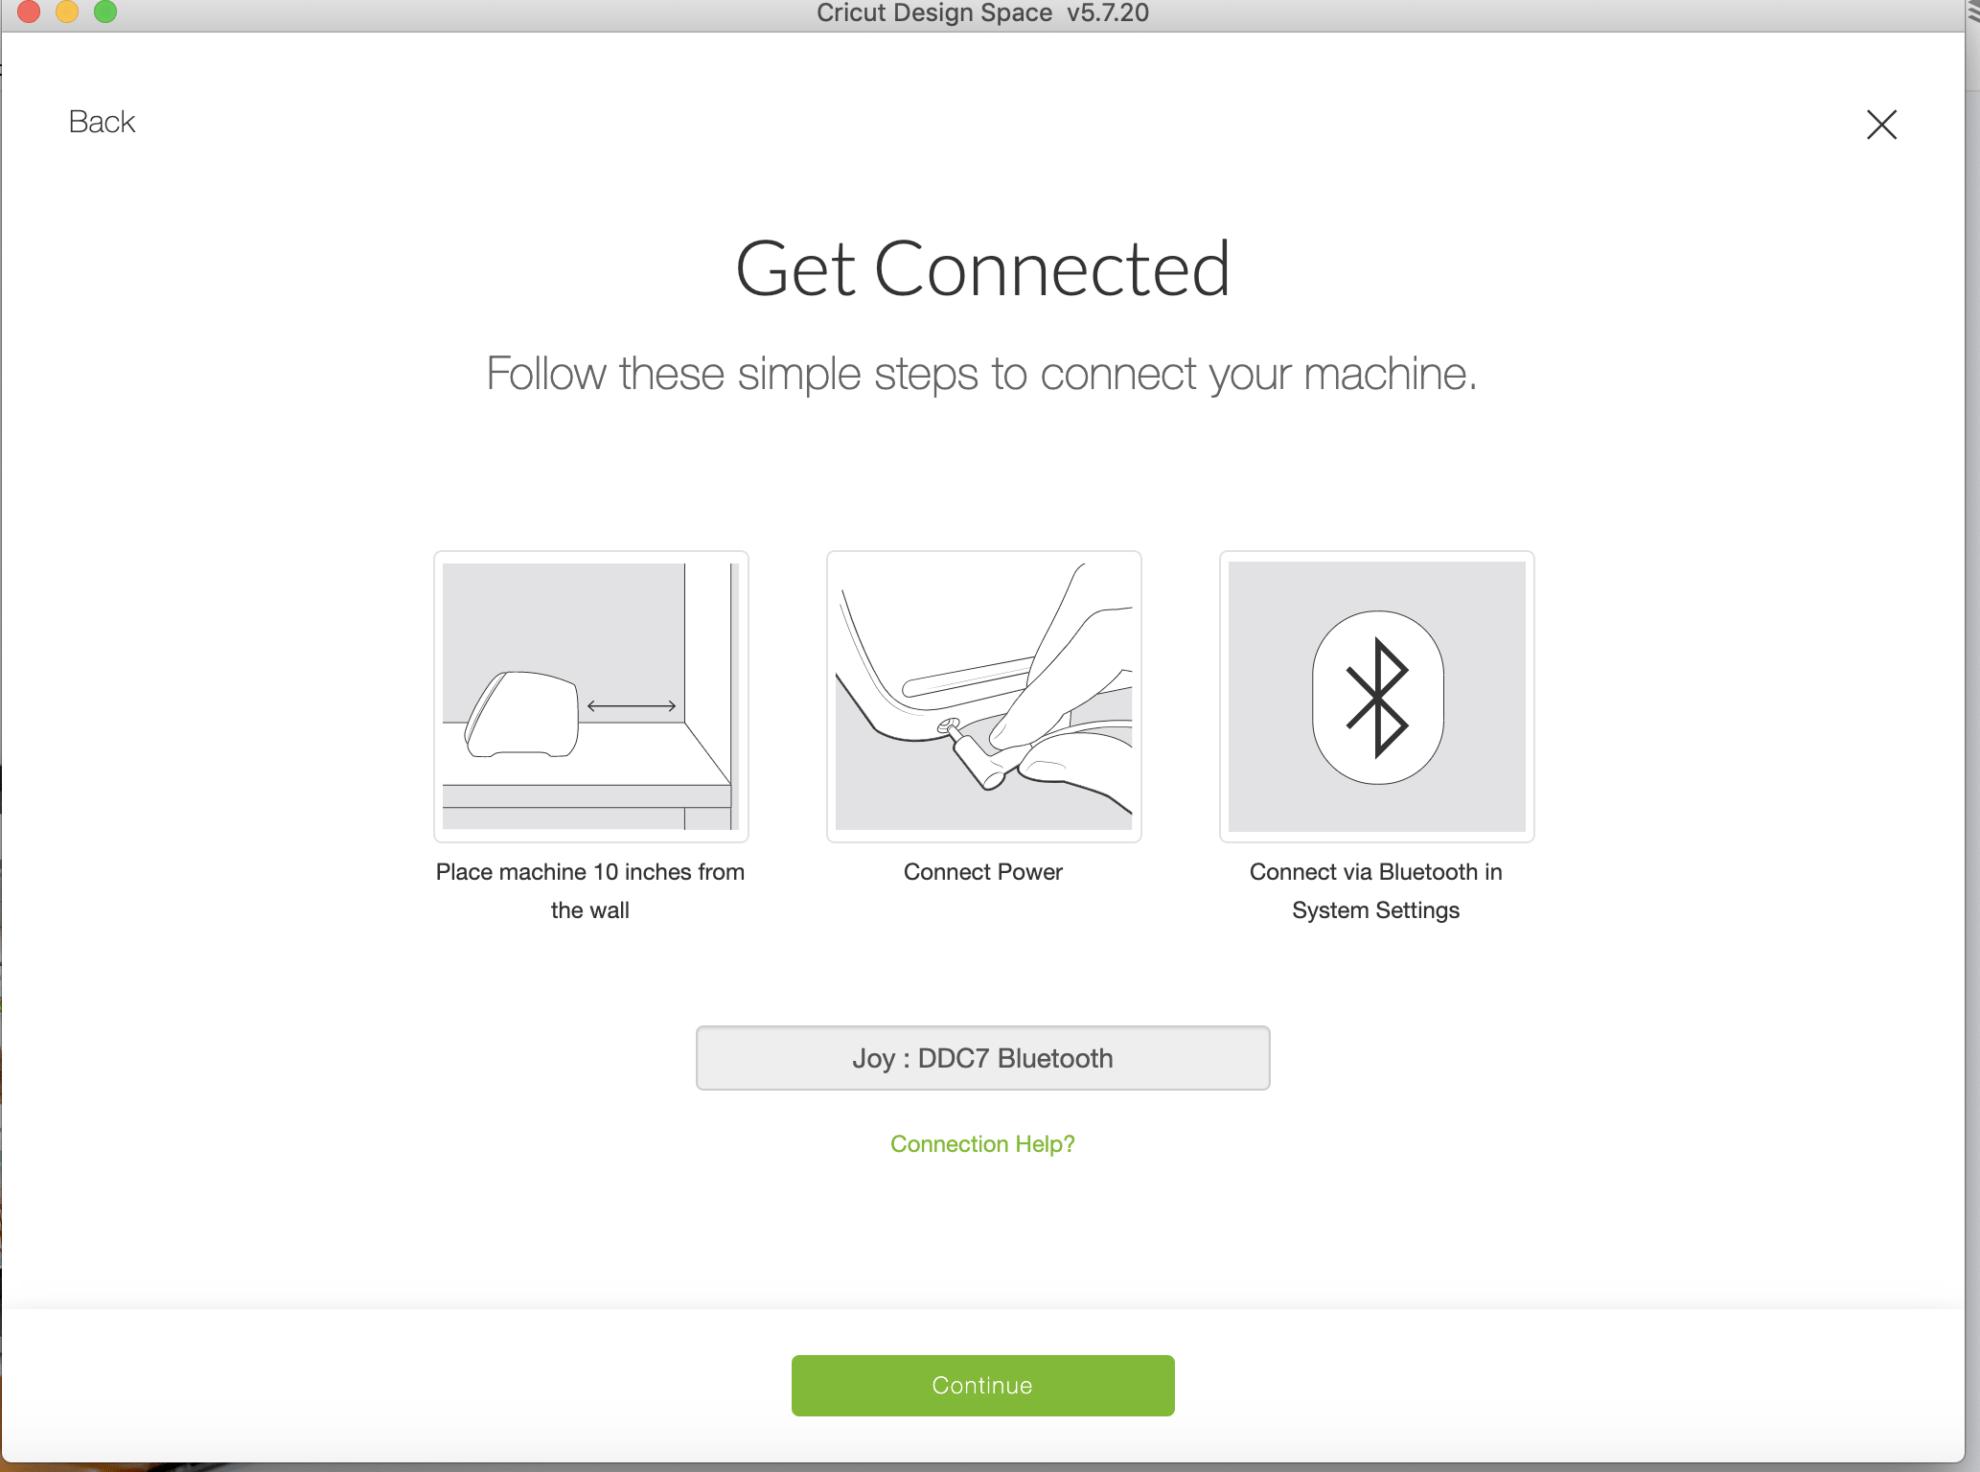 Get connected screenshot